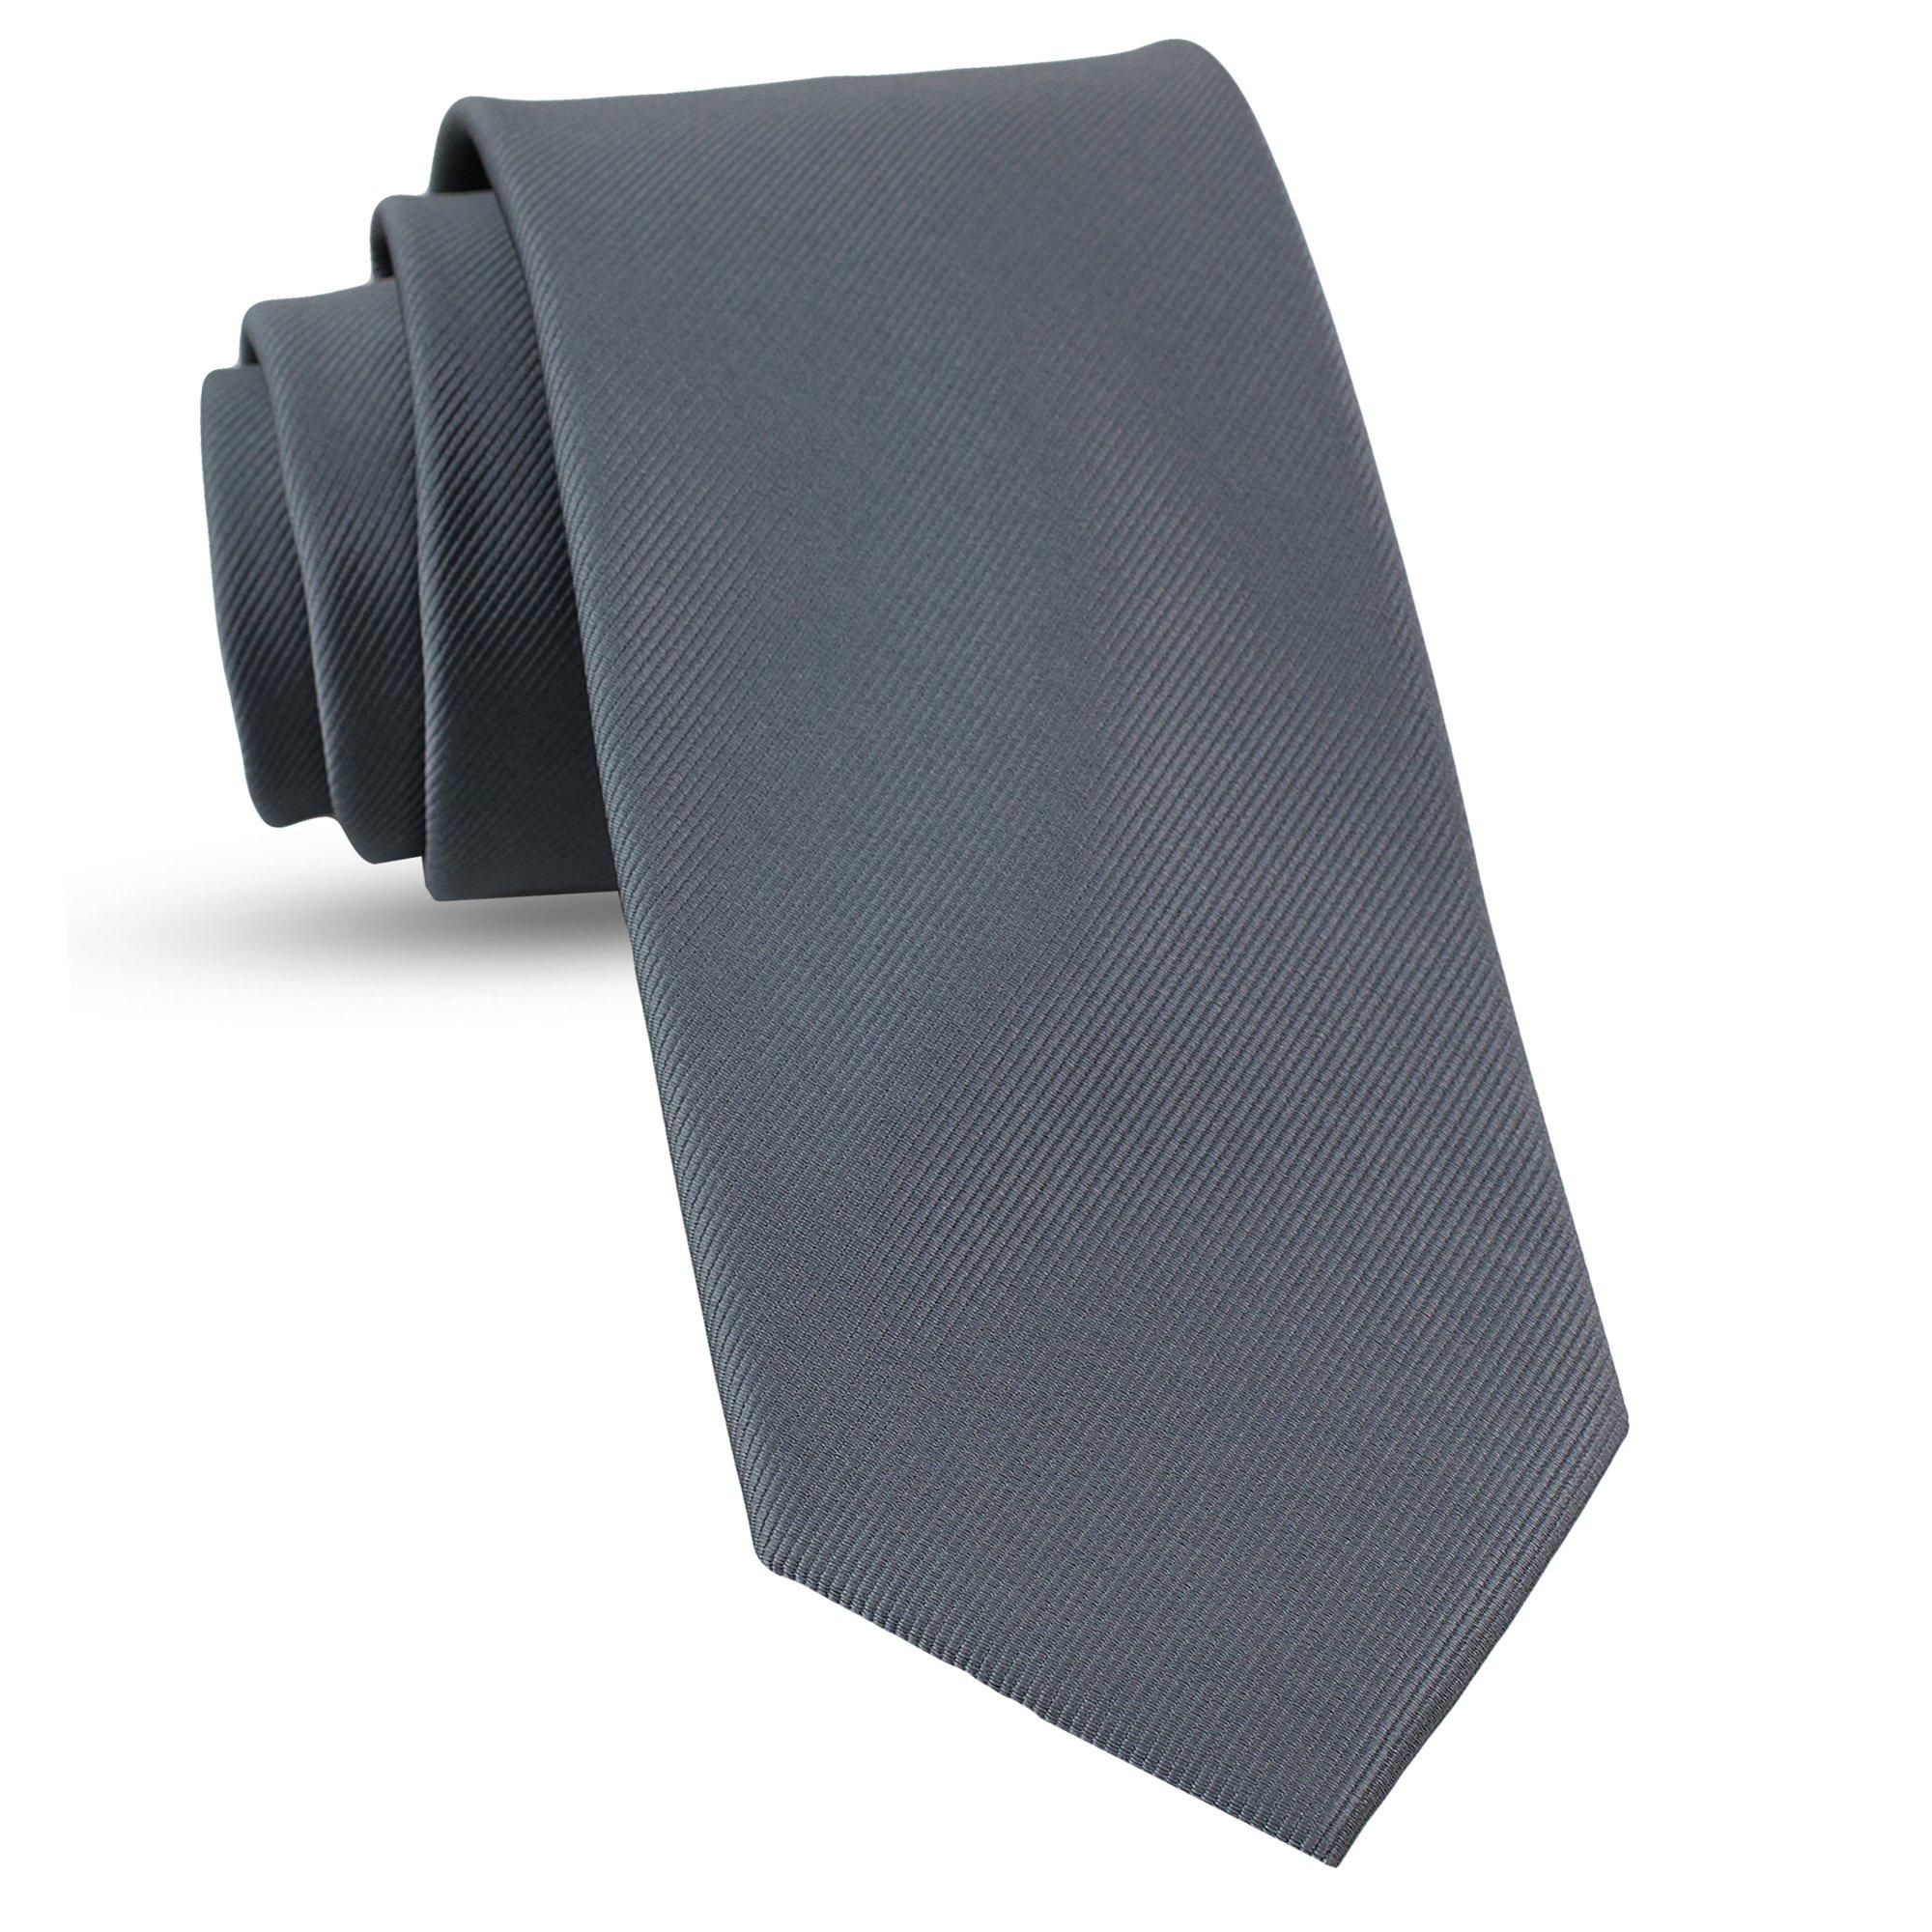 Handmade Gunmetal Grey Gray Ties For Men Skinny Woven Slim Tie Mens Ties : Thin Necktie, Solid Color Neckties 3''